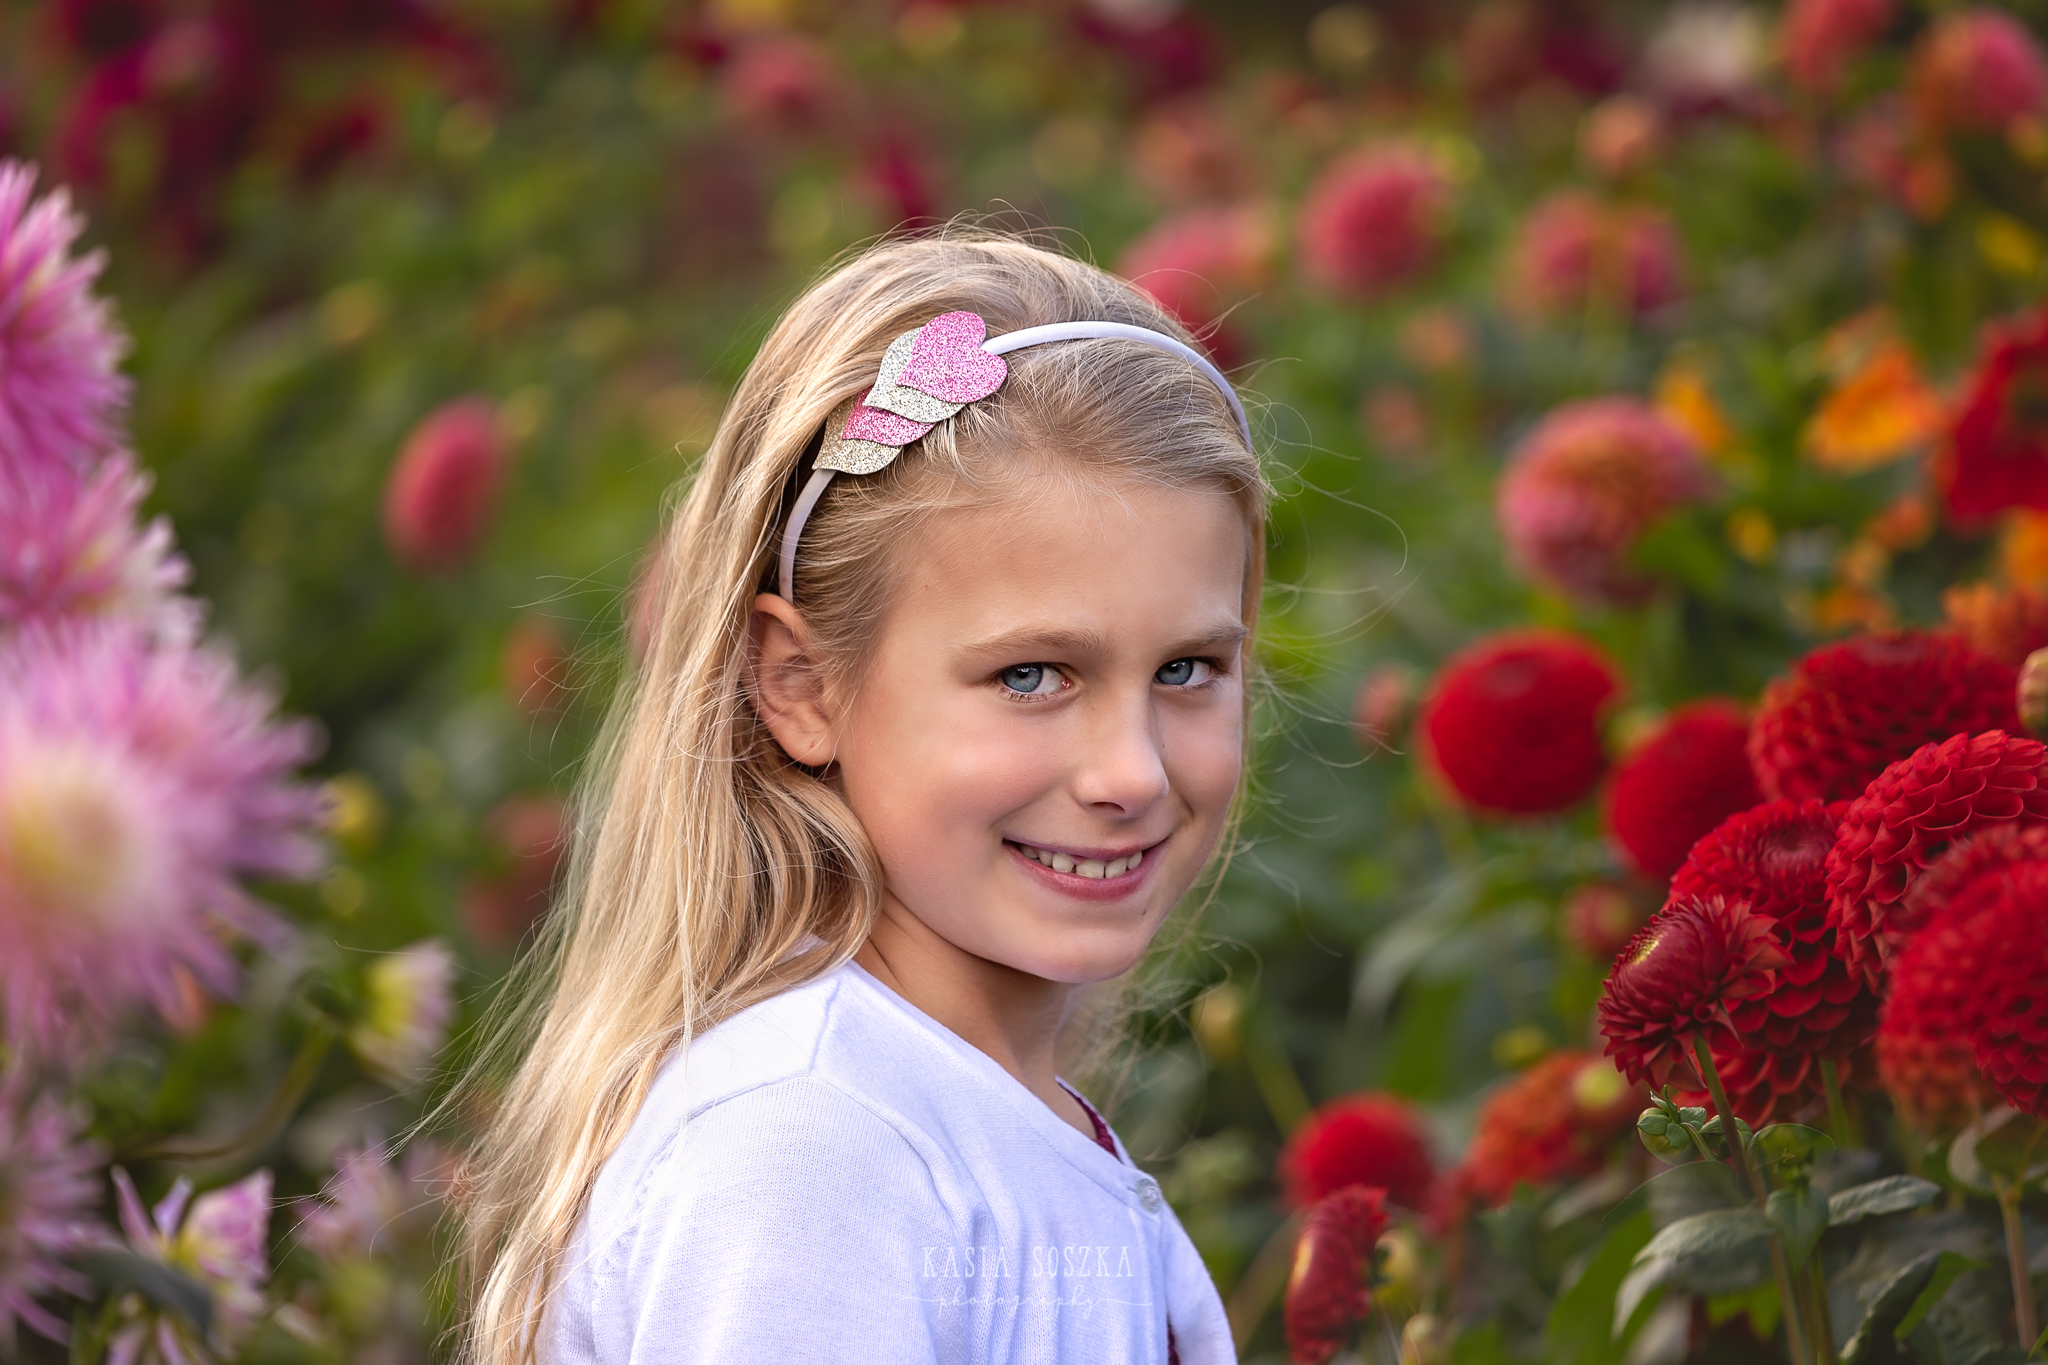 Children photography, child photographer Leeds, York, Bradford, Harrogate: pretty blond girl with blue eyes posing for a portrait against red autumn flowers